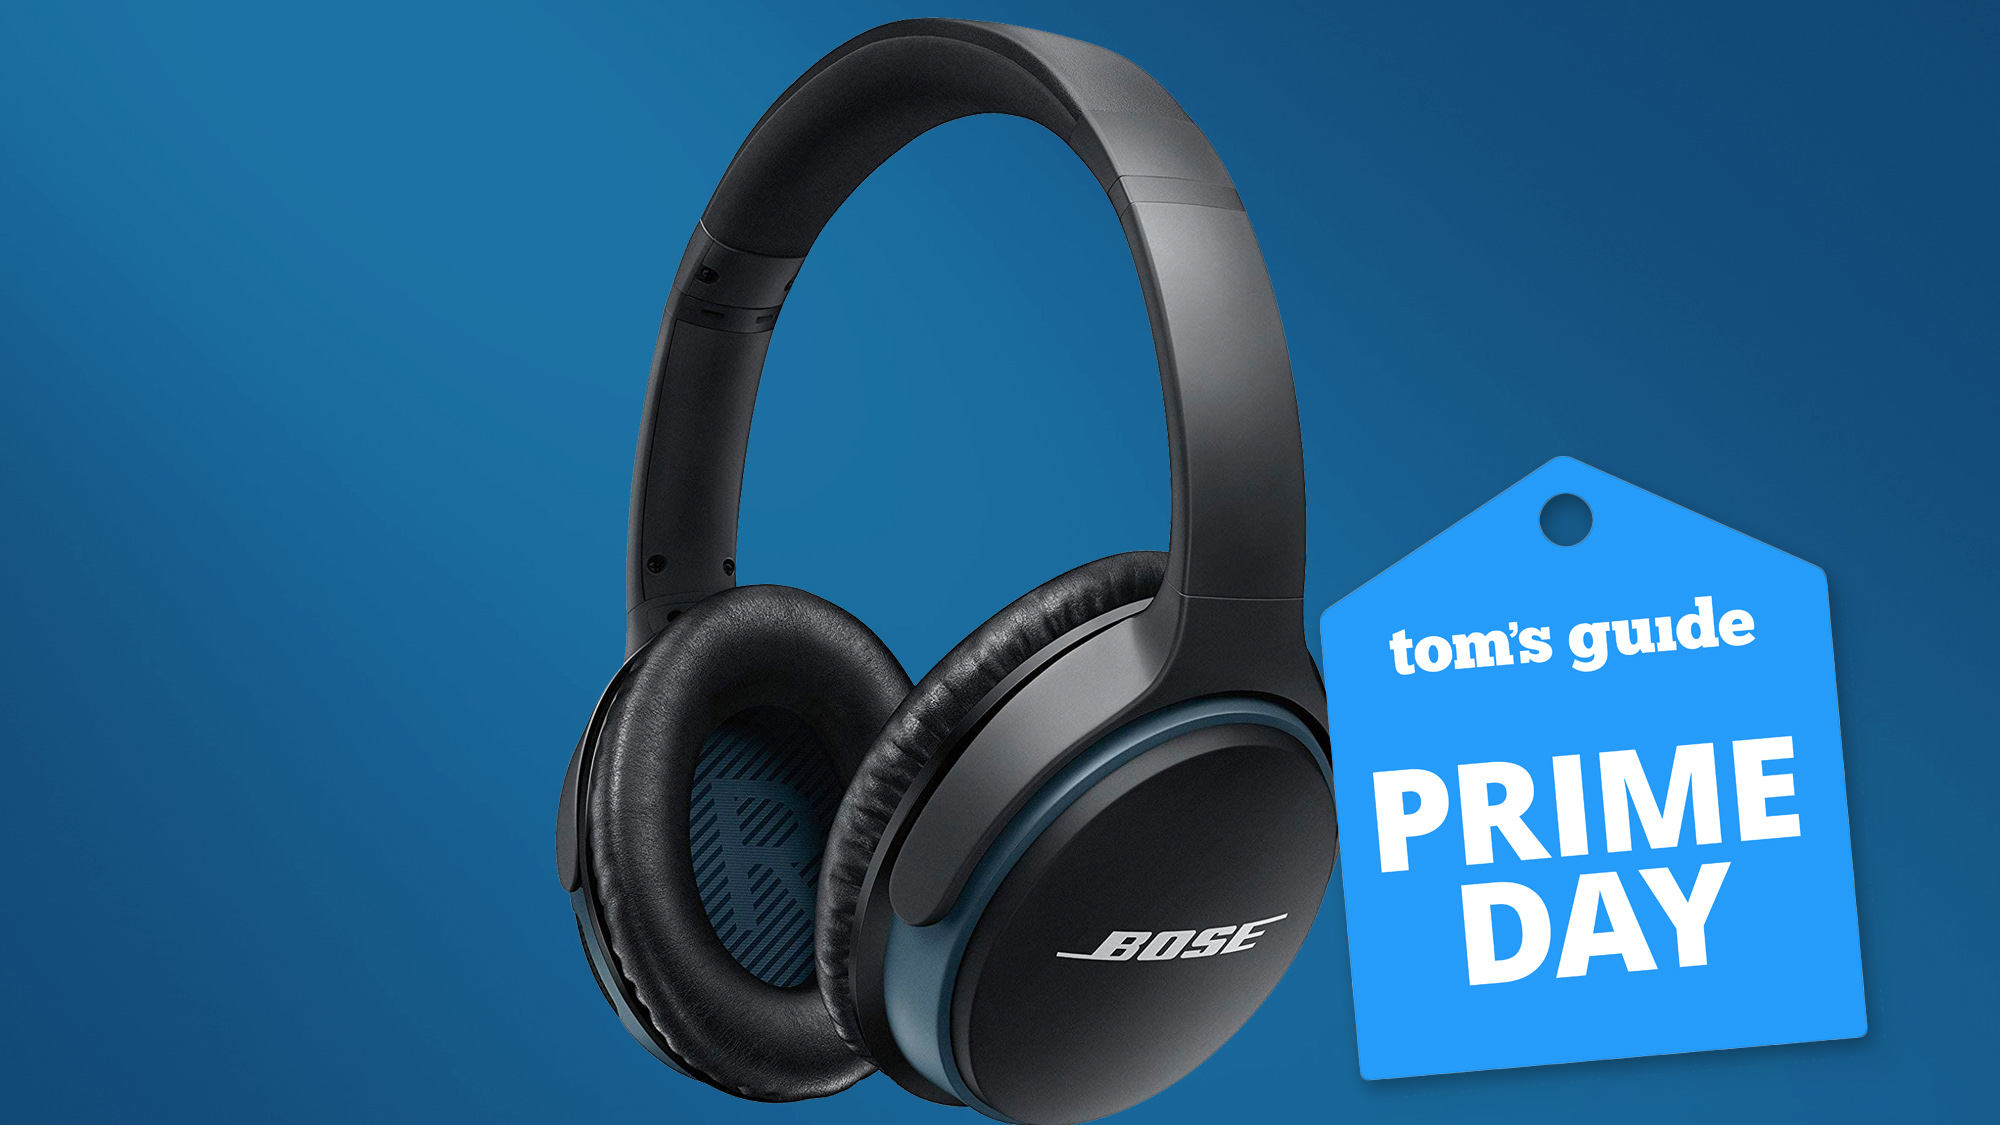 Bose SoundLink Around Ear Wireless Headphones II Prime Day deal